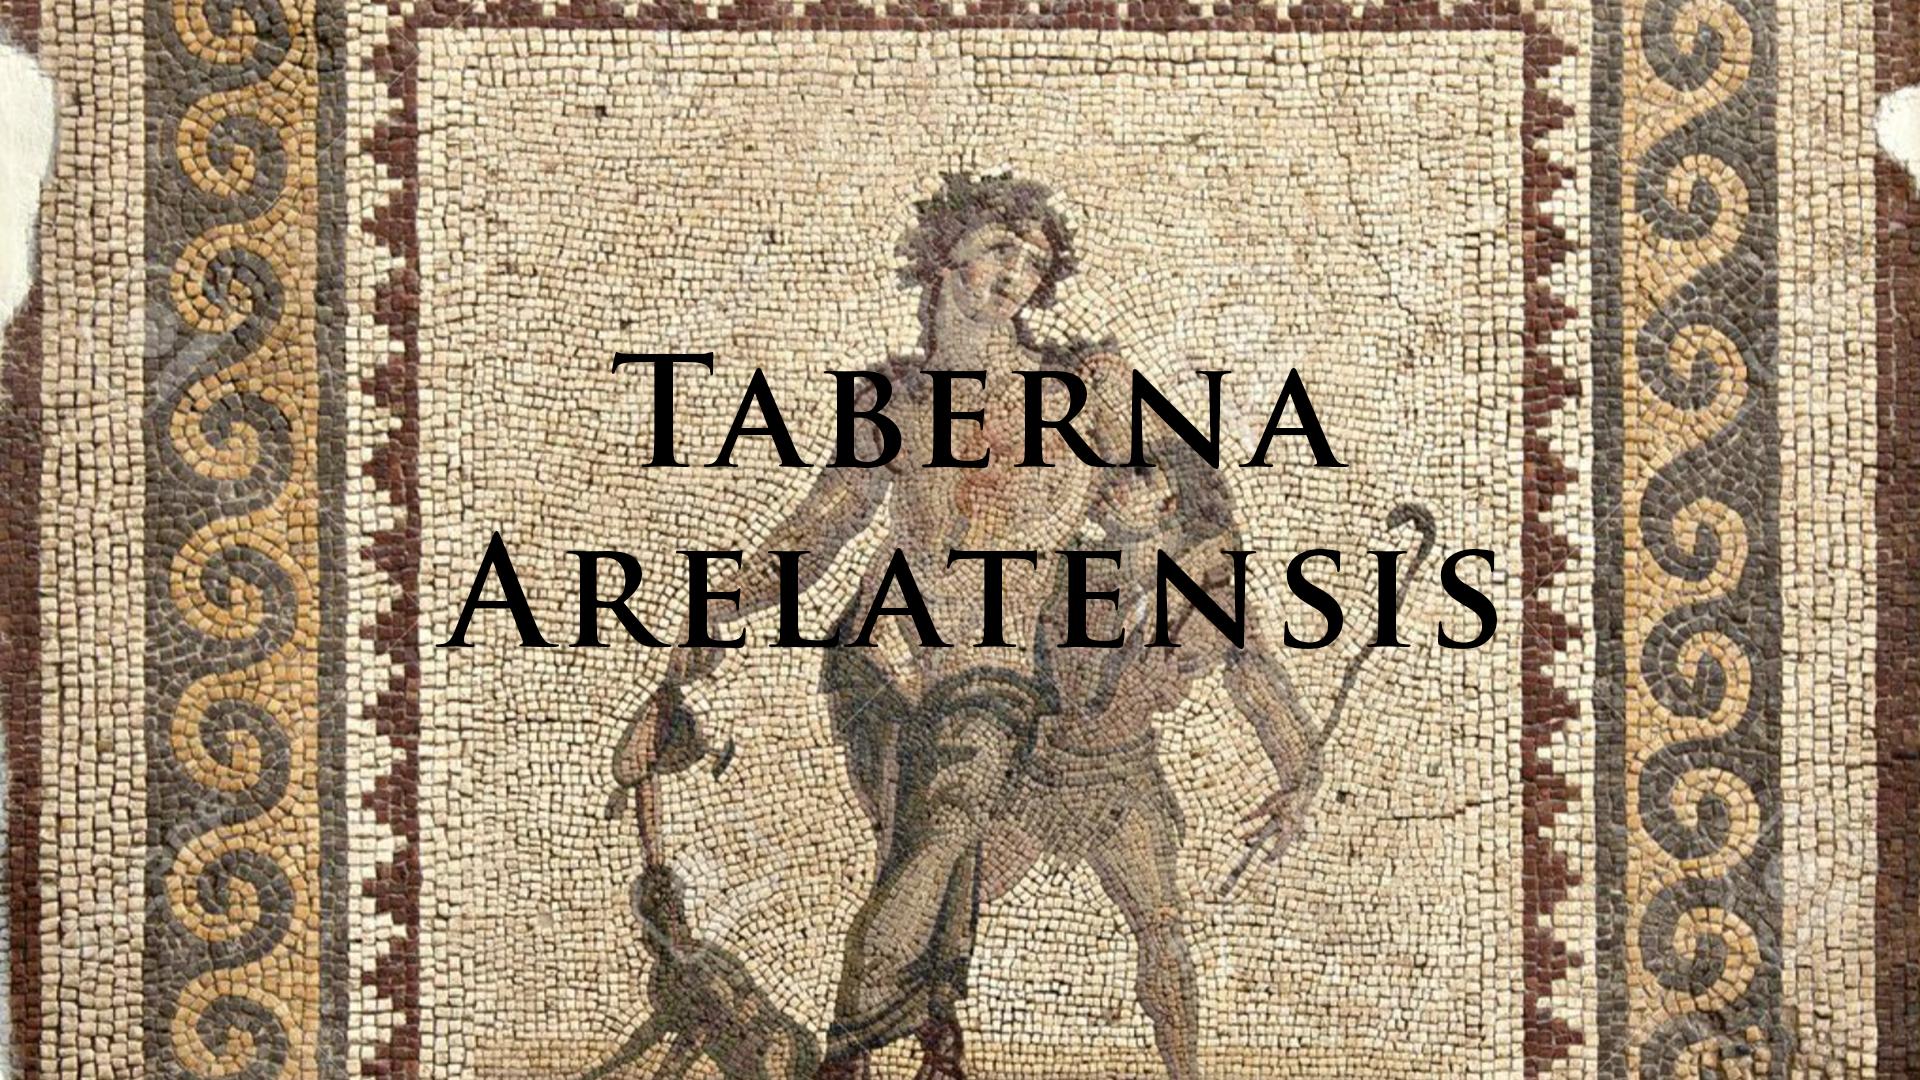 Taberna arelatensis. Bar à cervoise éphémère